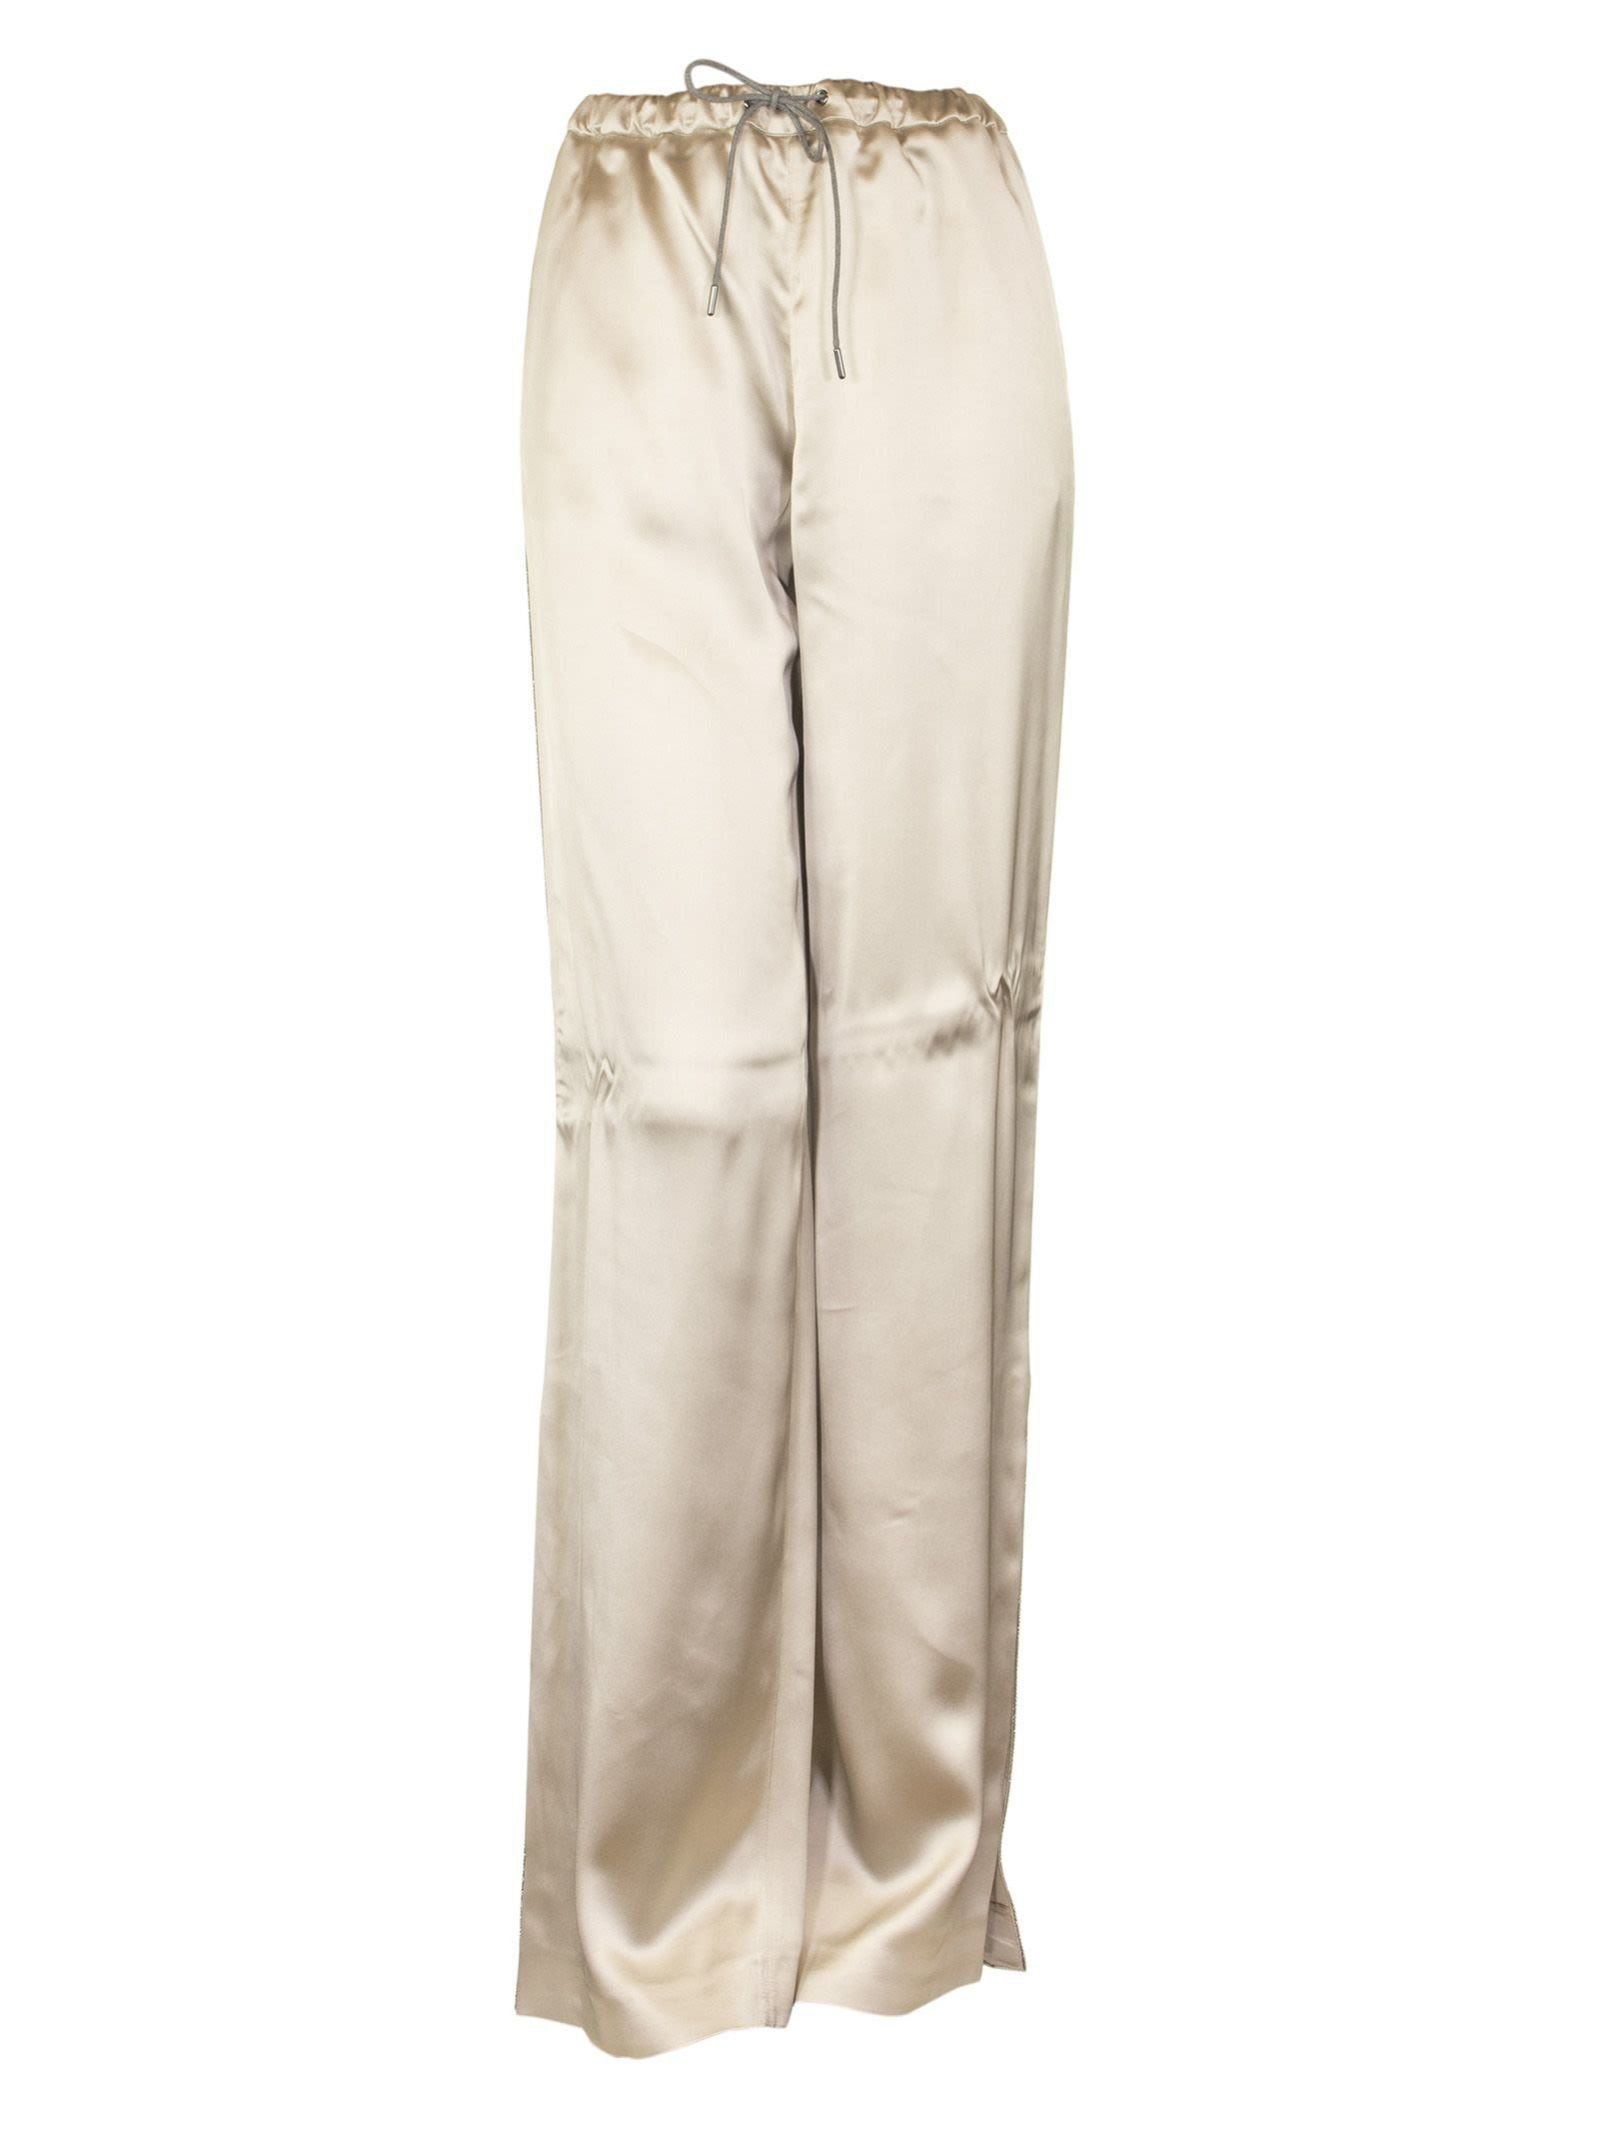 Fabiana Filippi Gubbio Woven Viscose Pants, Beige And Grey